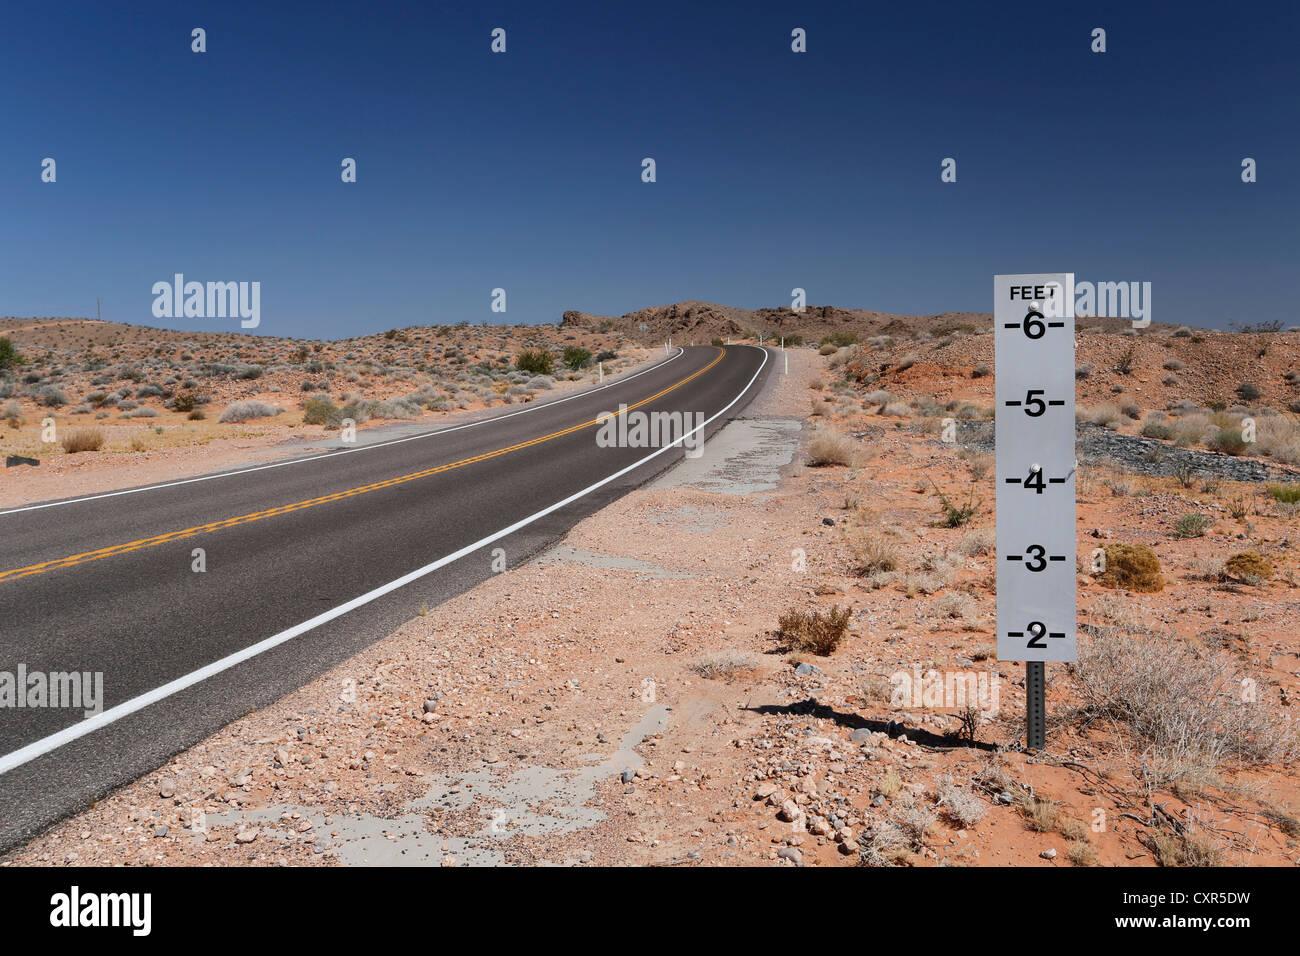 Warning sign, danger of flash floods on a desert road in Nevada, USA - Stock Image